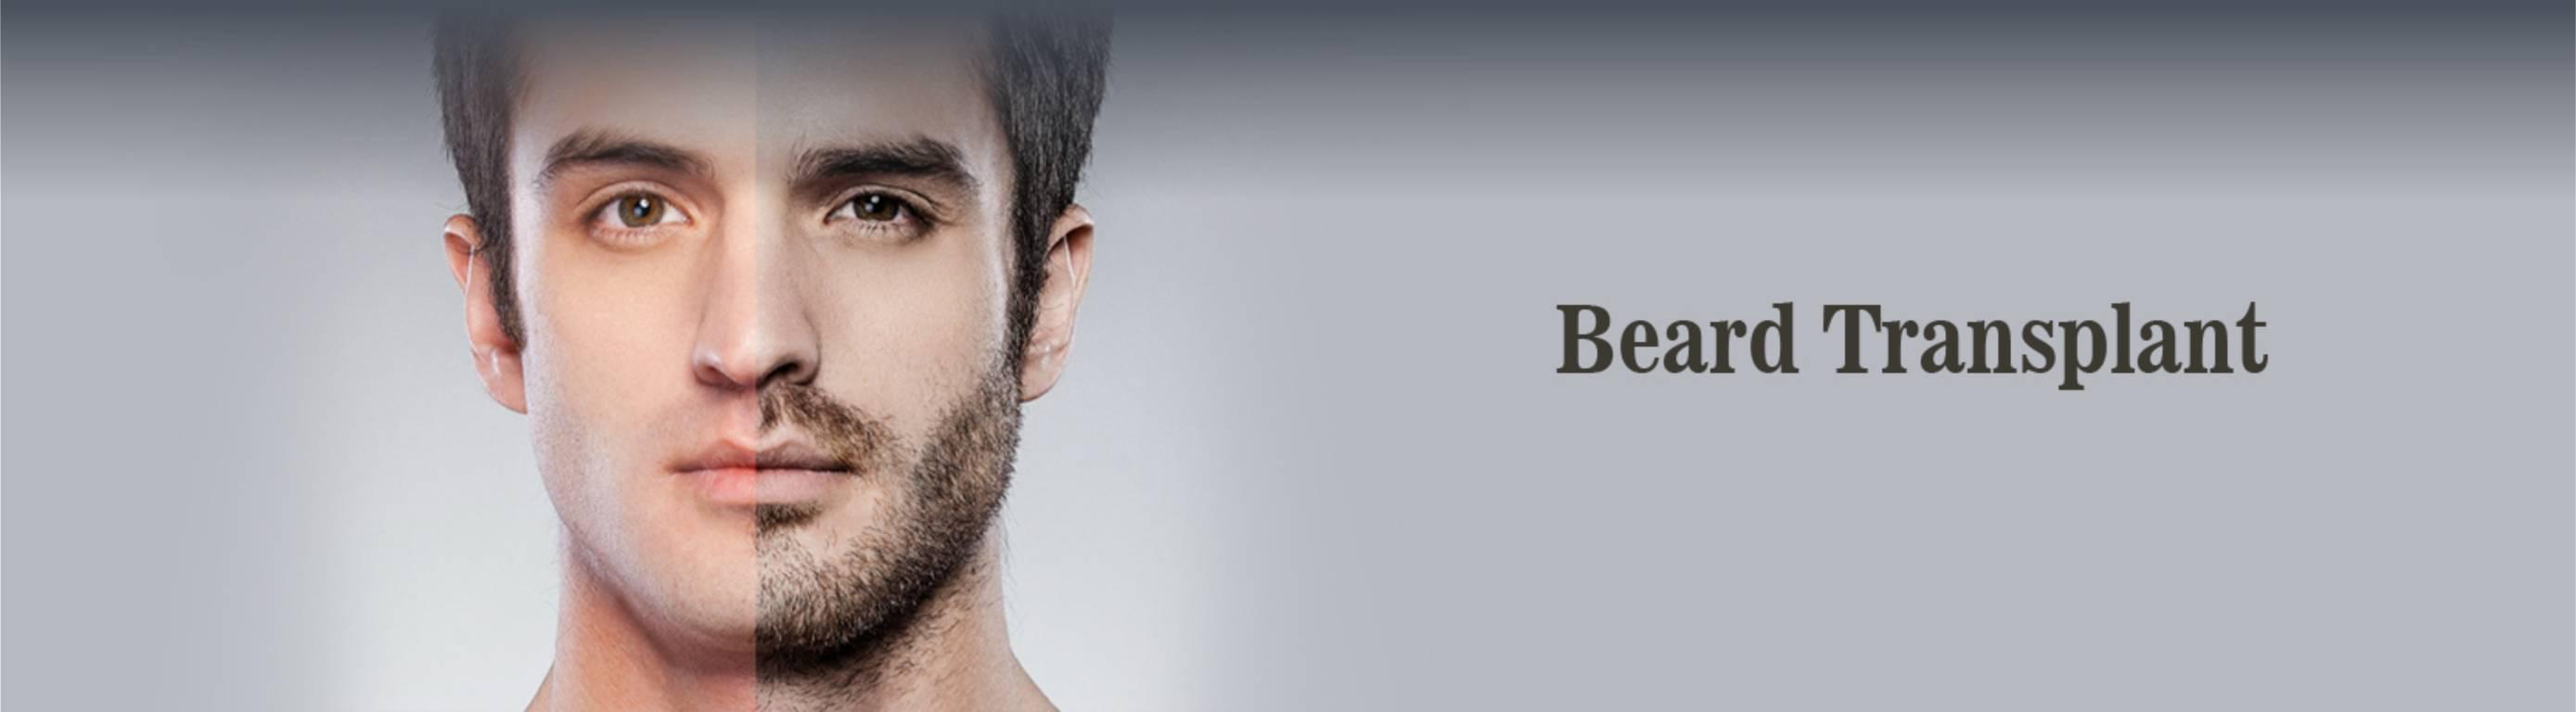 Beard Transplant copy